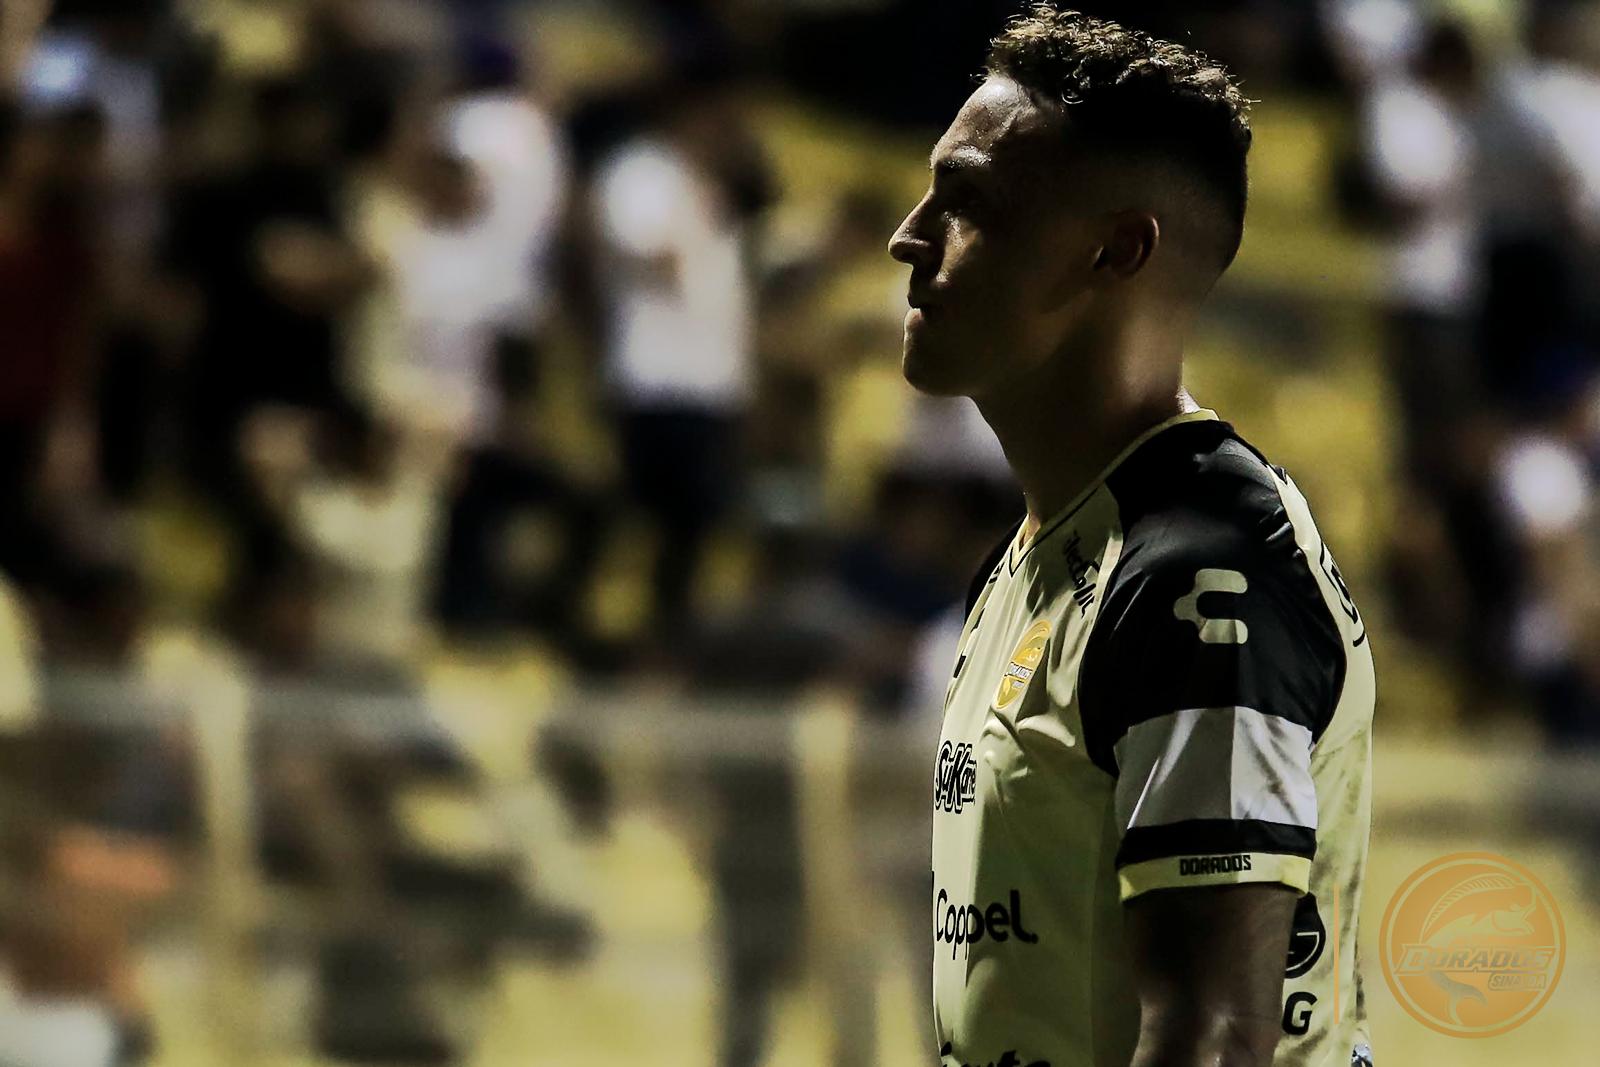 Dorados 2-2 Zacatepec | Jornada 8